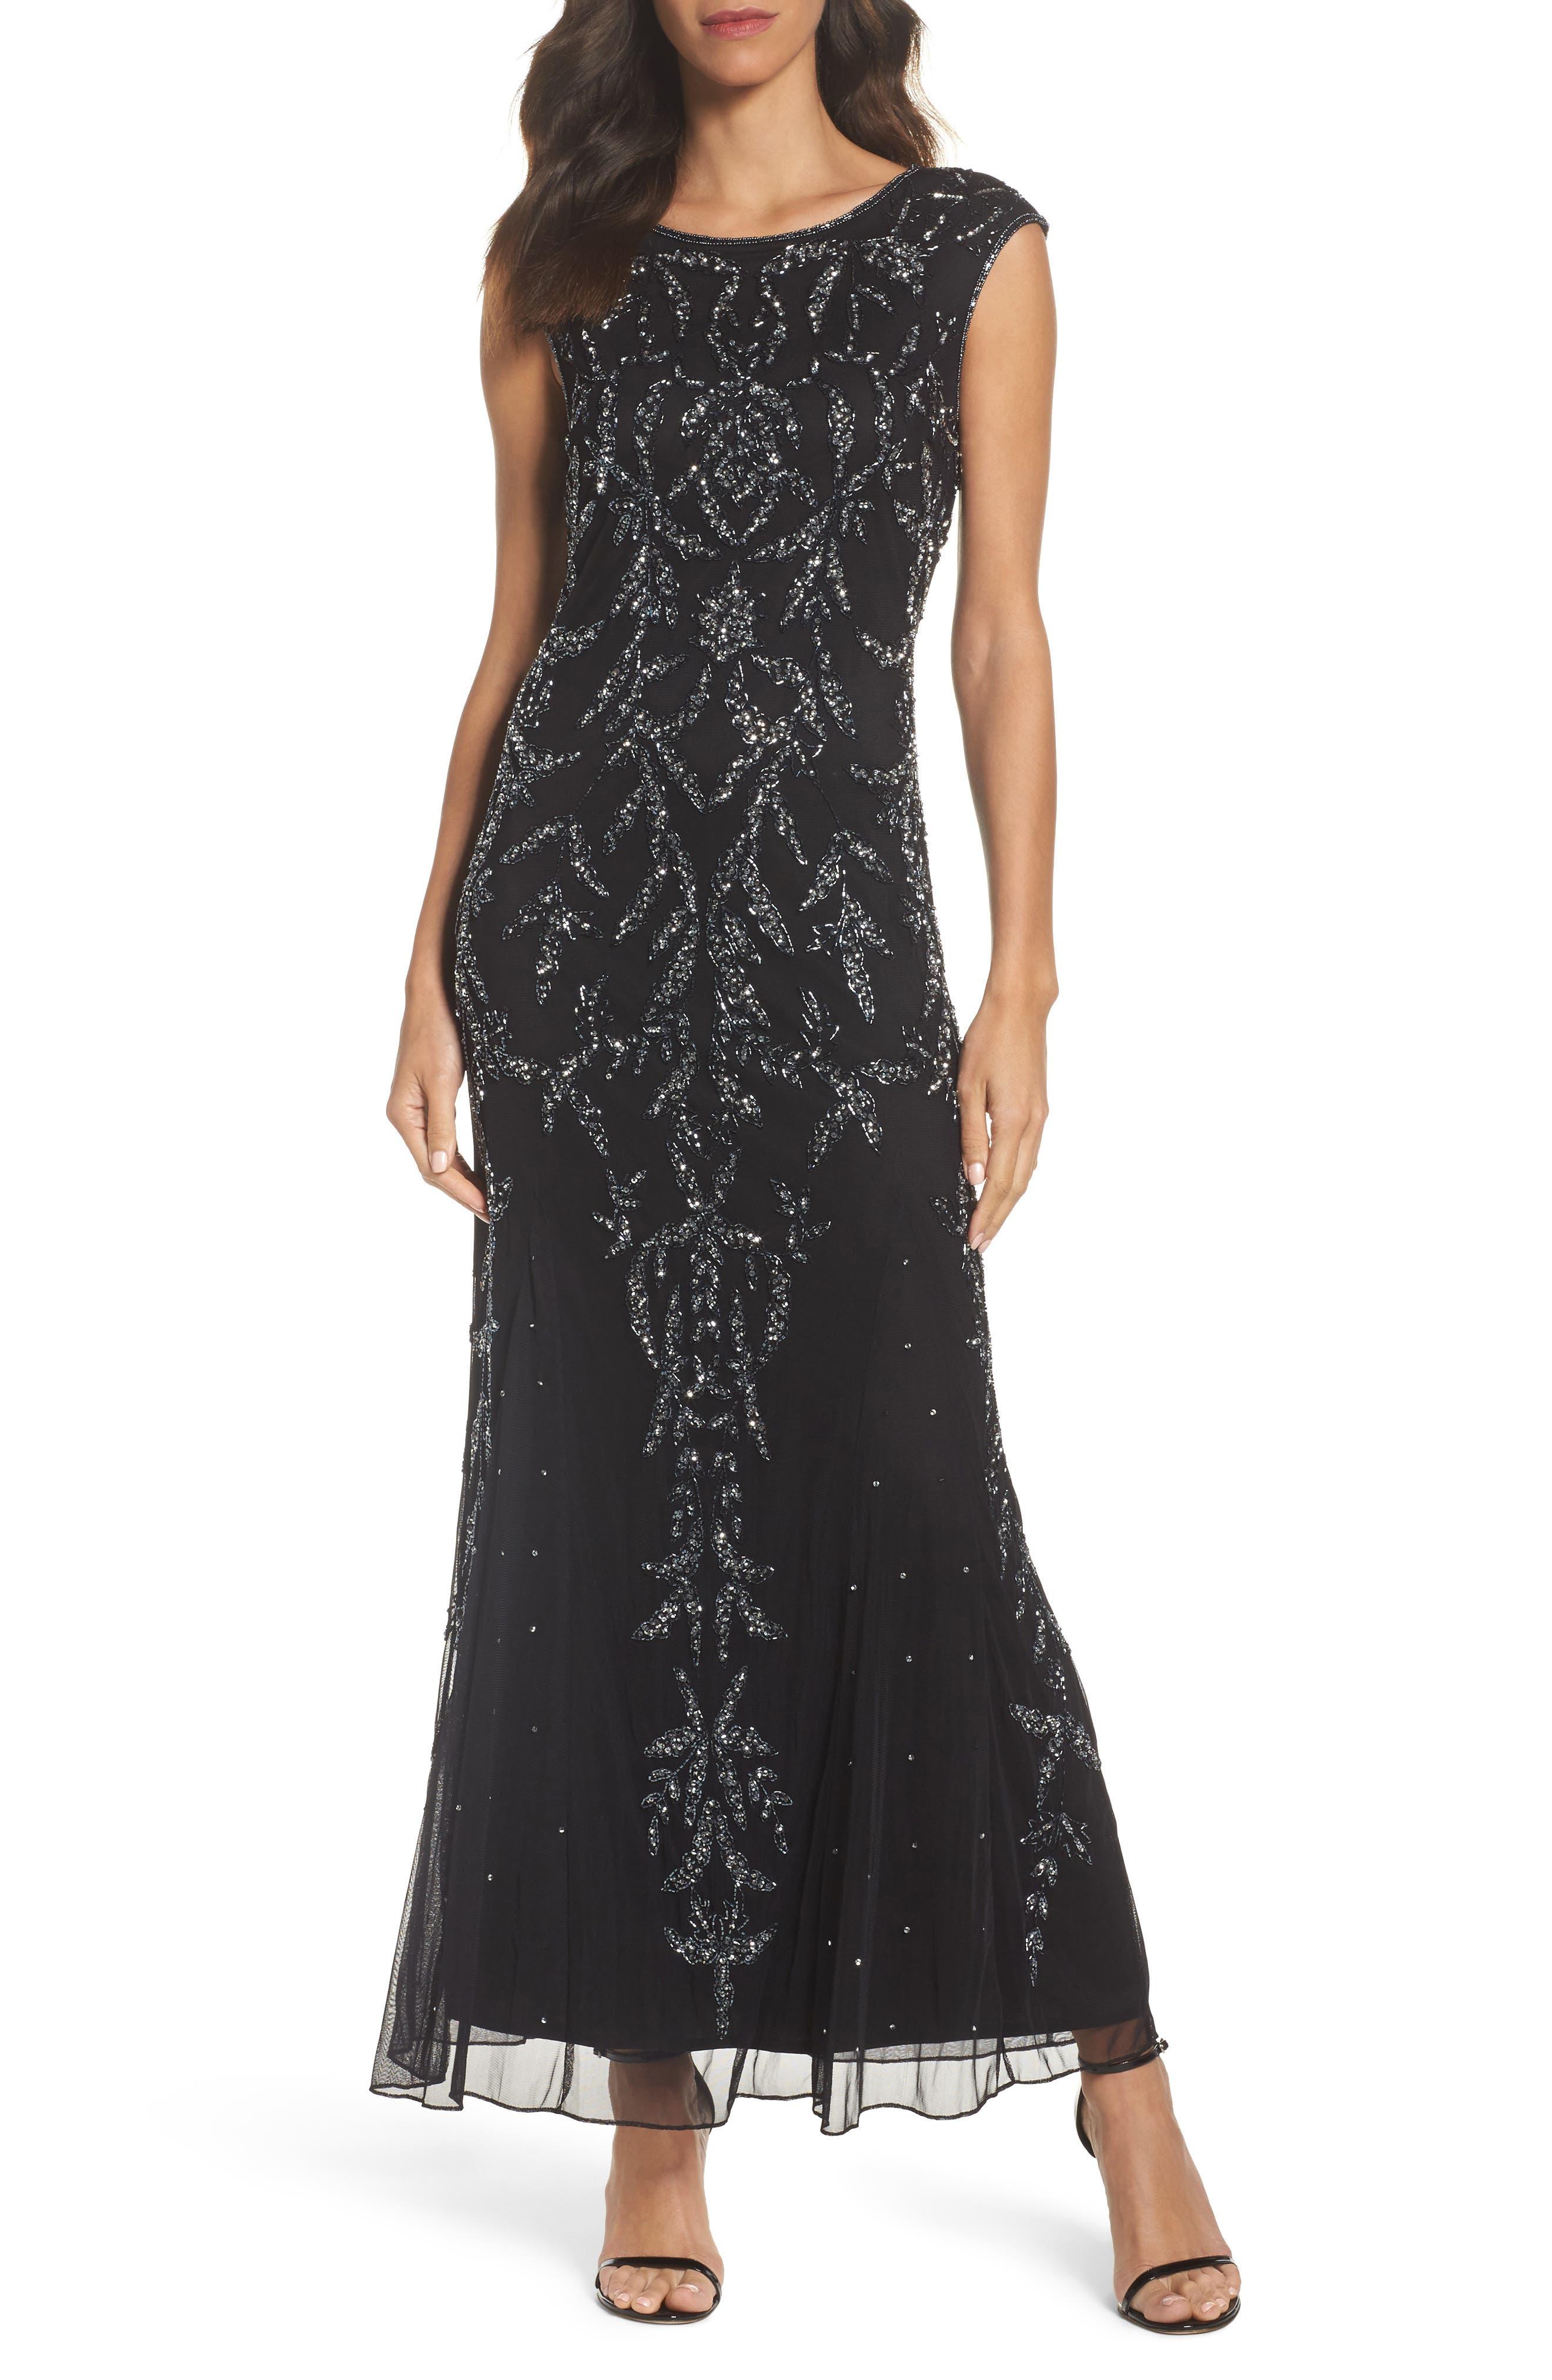 Alternate Image 1 Selected - Pisarro Nights Floral Motif Embellished Gown